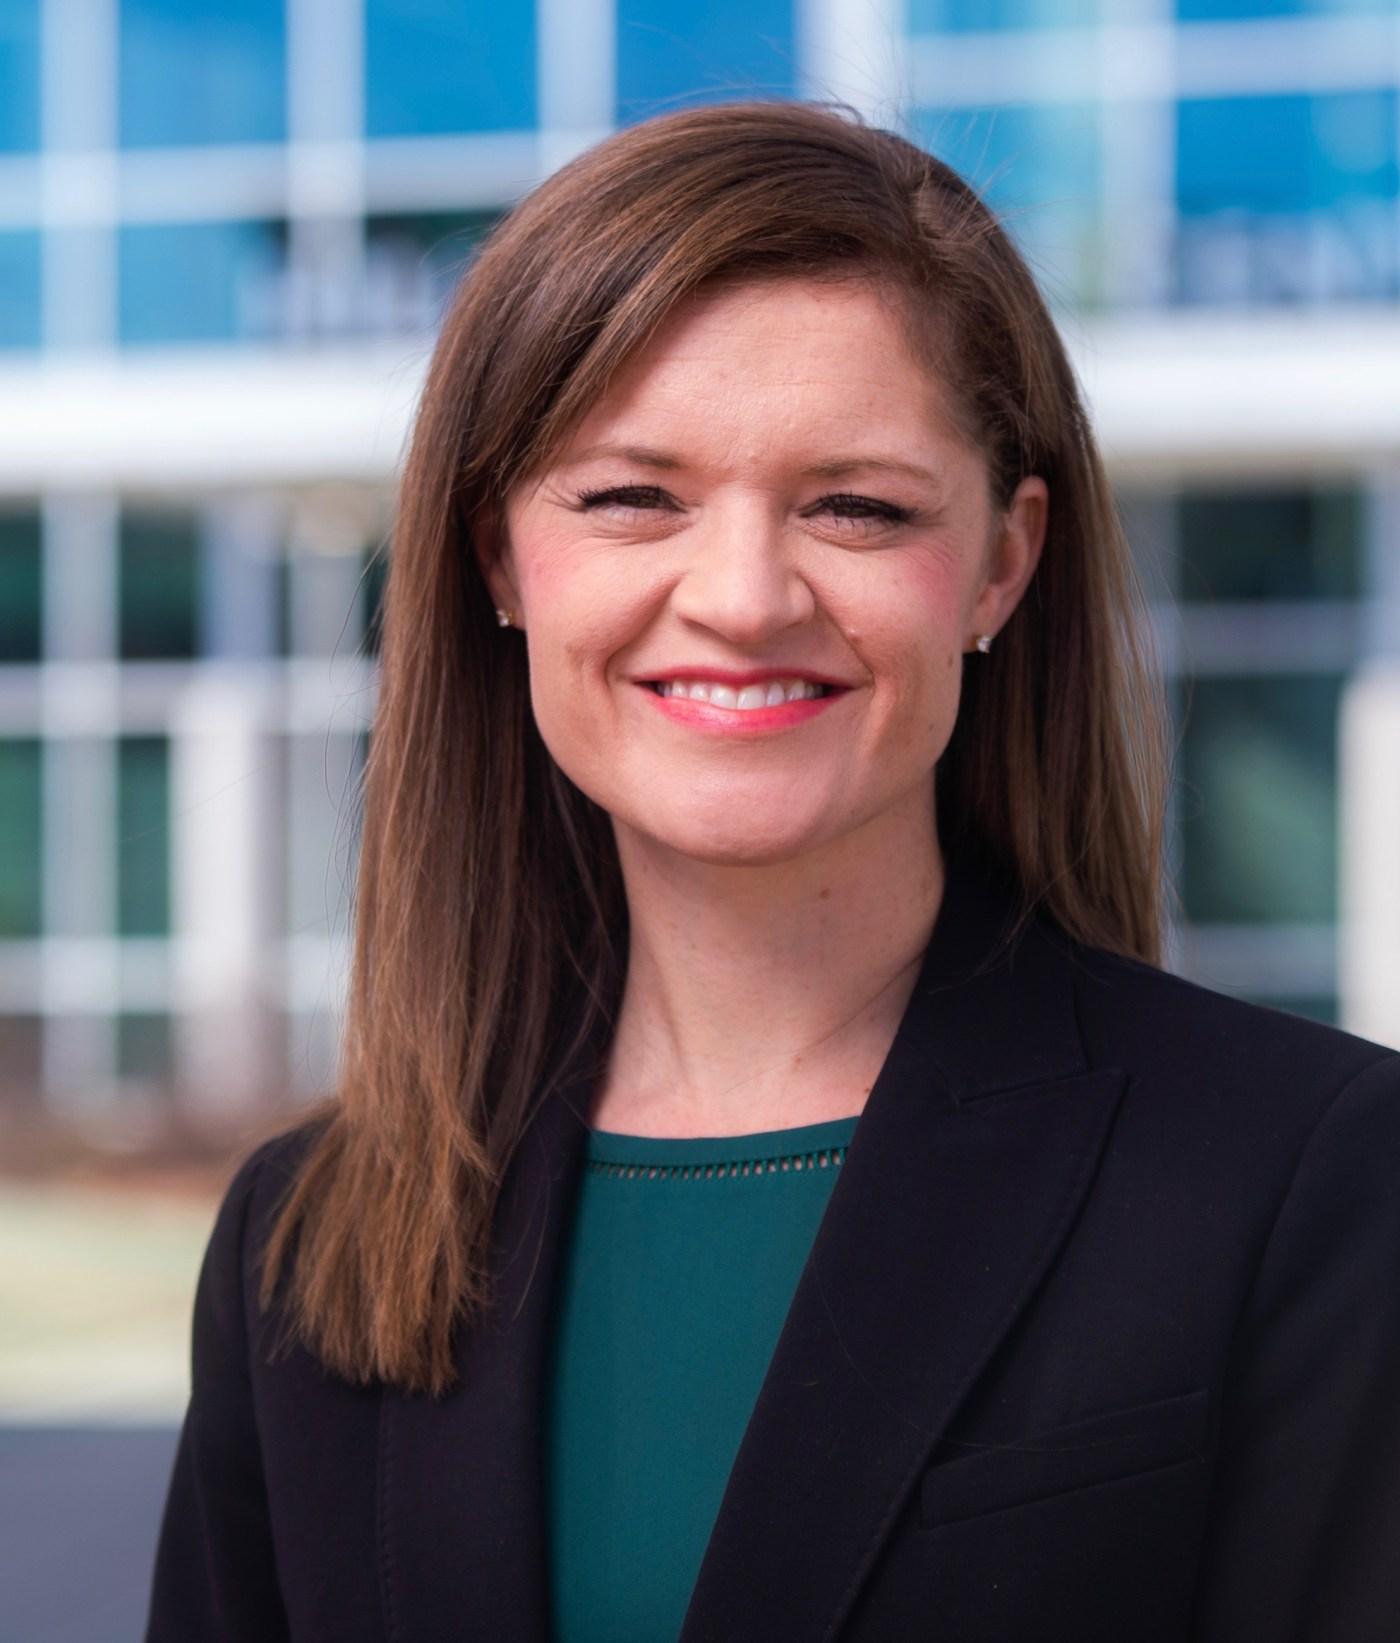 Emily Wykle - Birmingham Young American Leaders Program